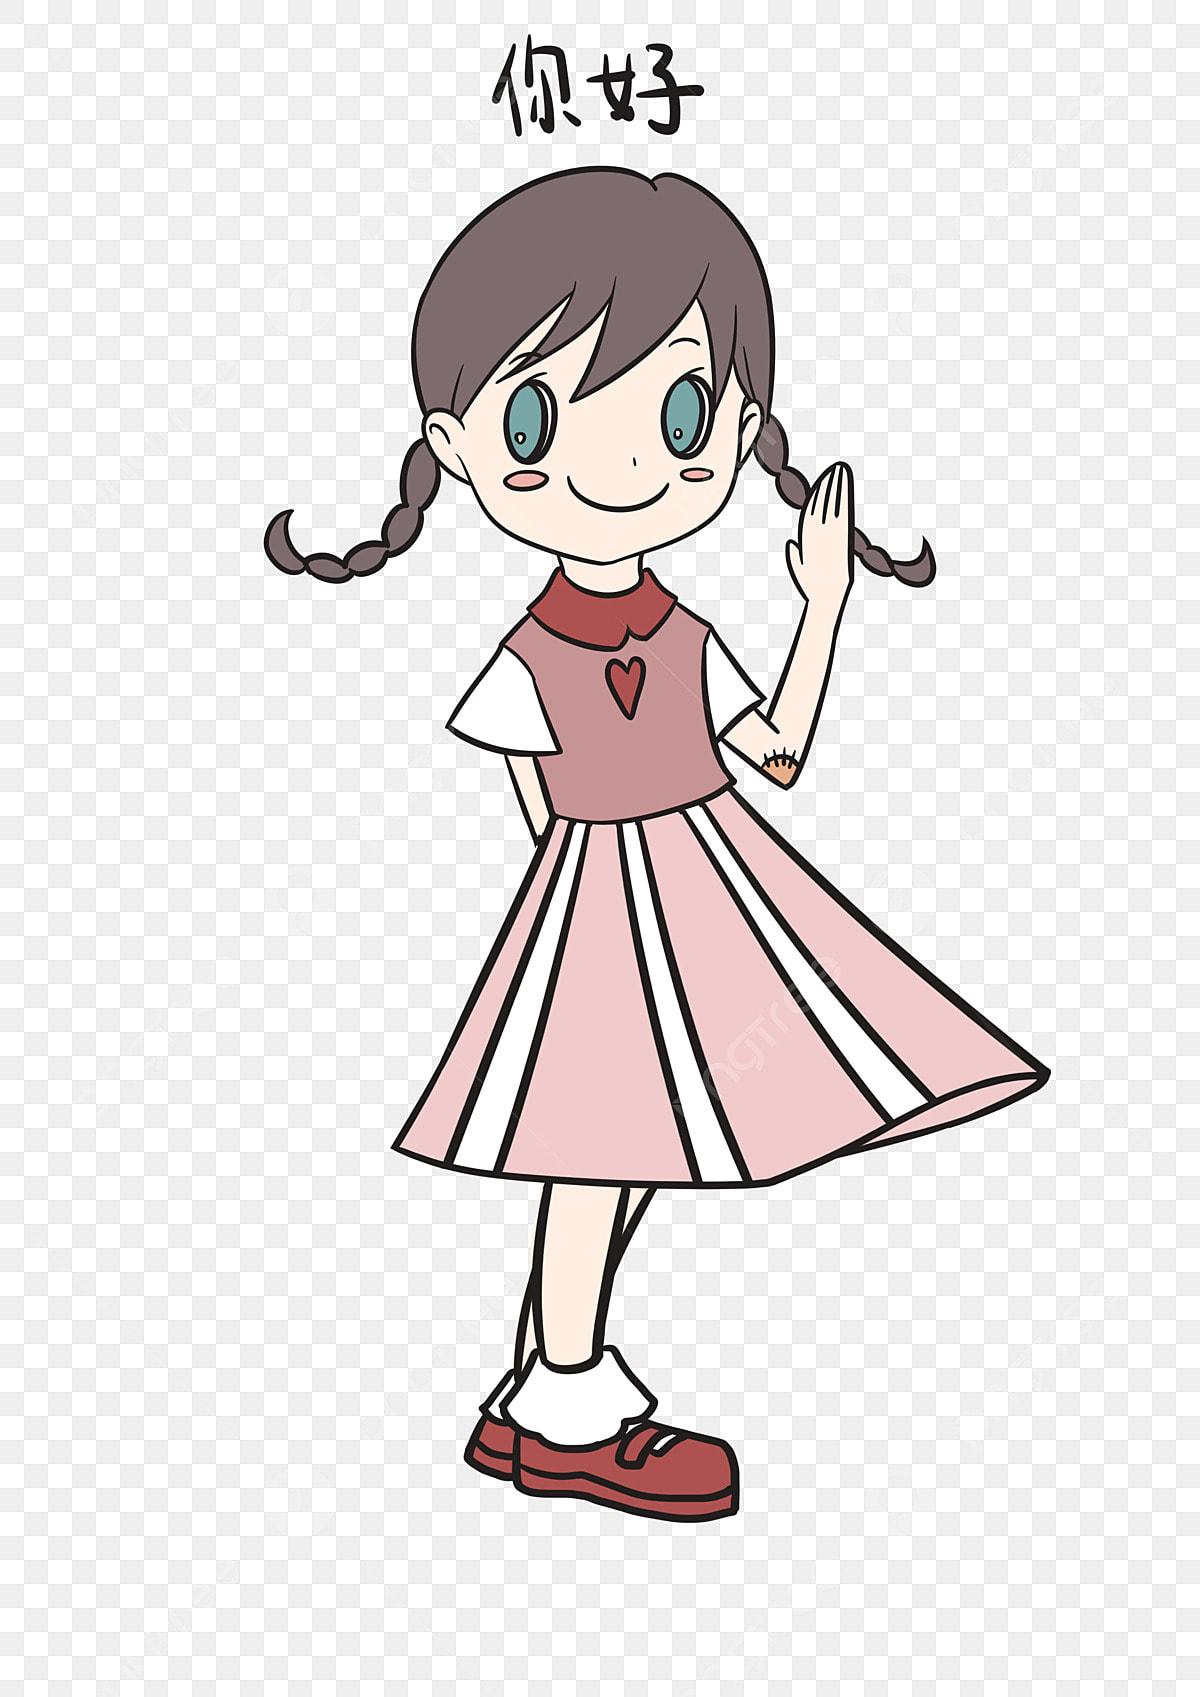 Ekspresi Hello Pek Ekspresi Gadis Kecil Ekspresi Gadis Kecil